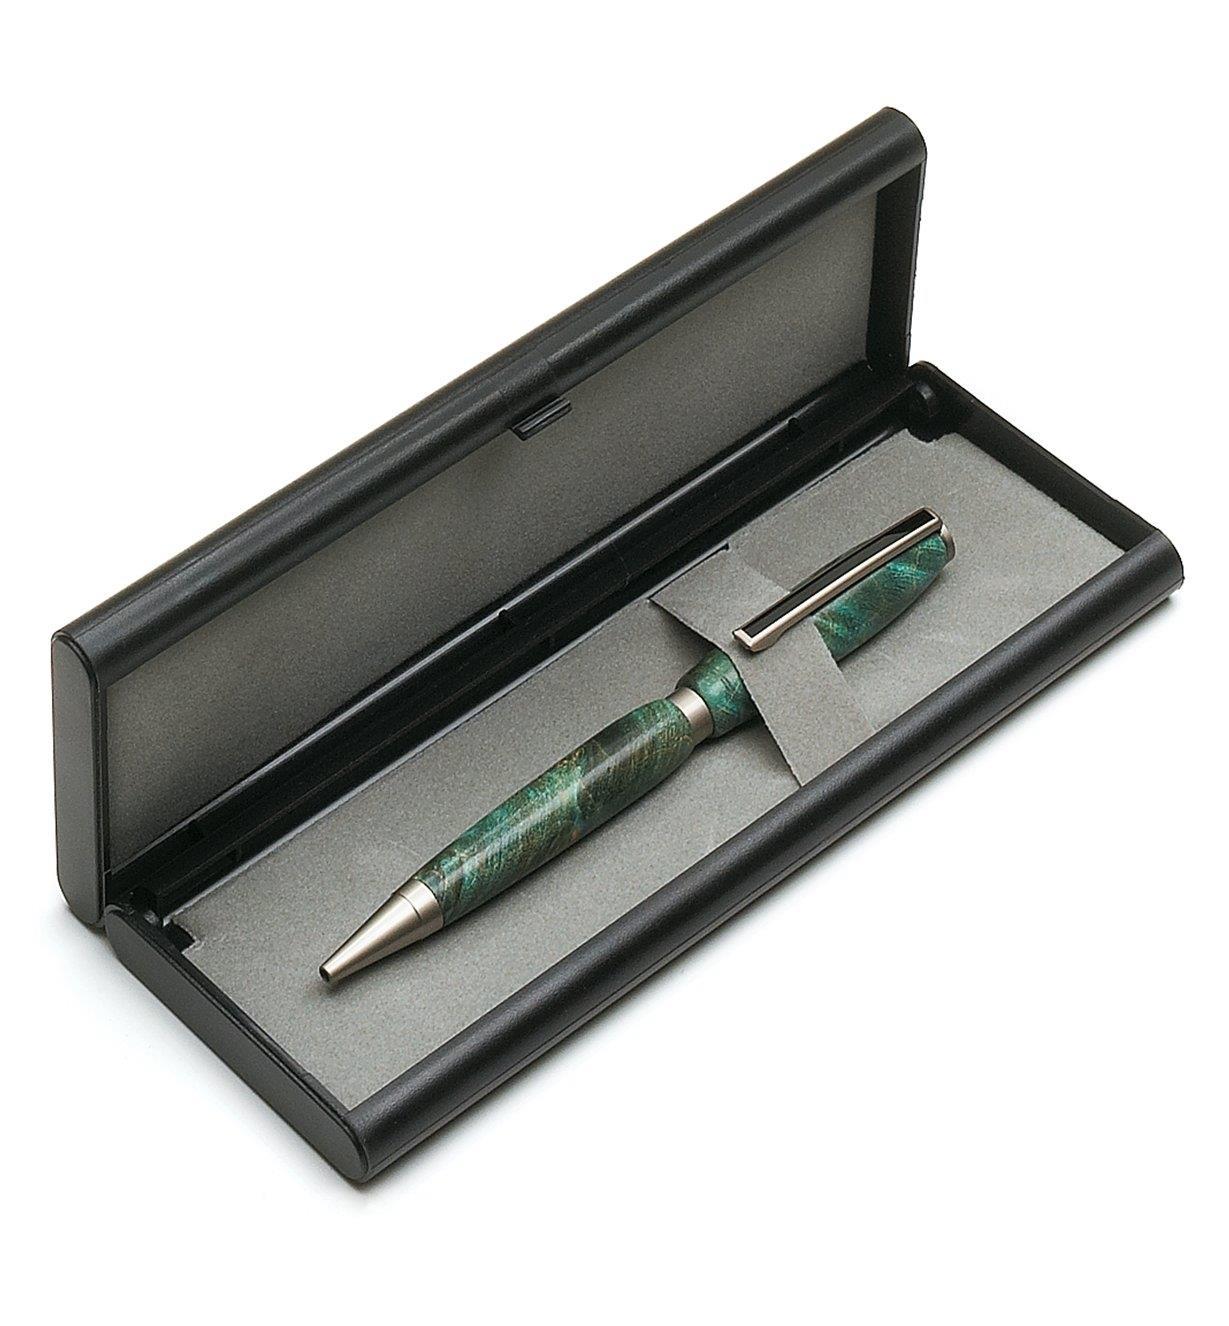 Plastic/felt case holding a wooden pen